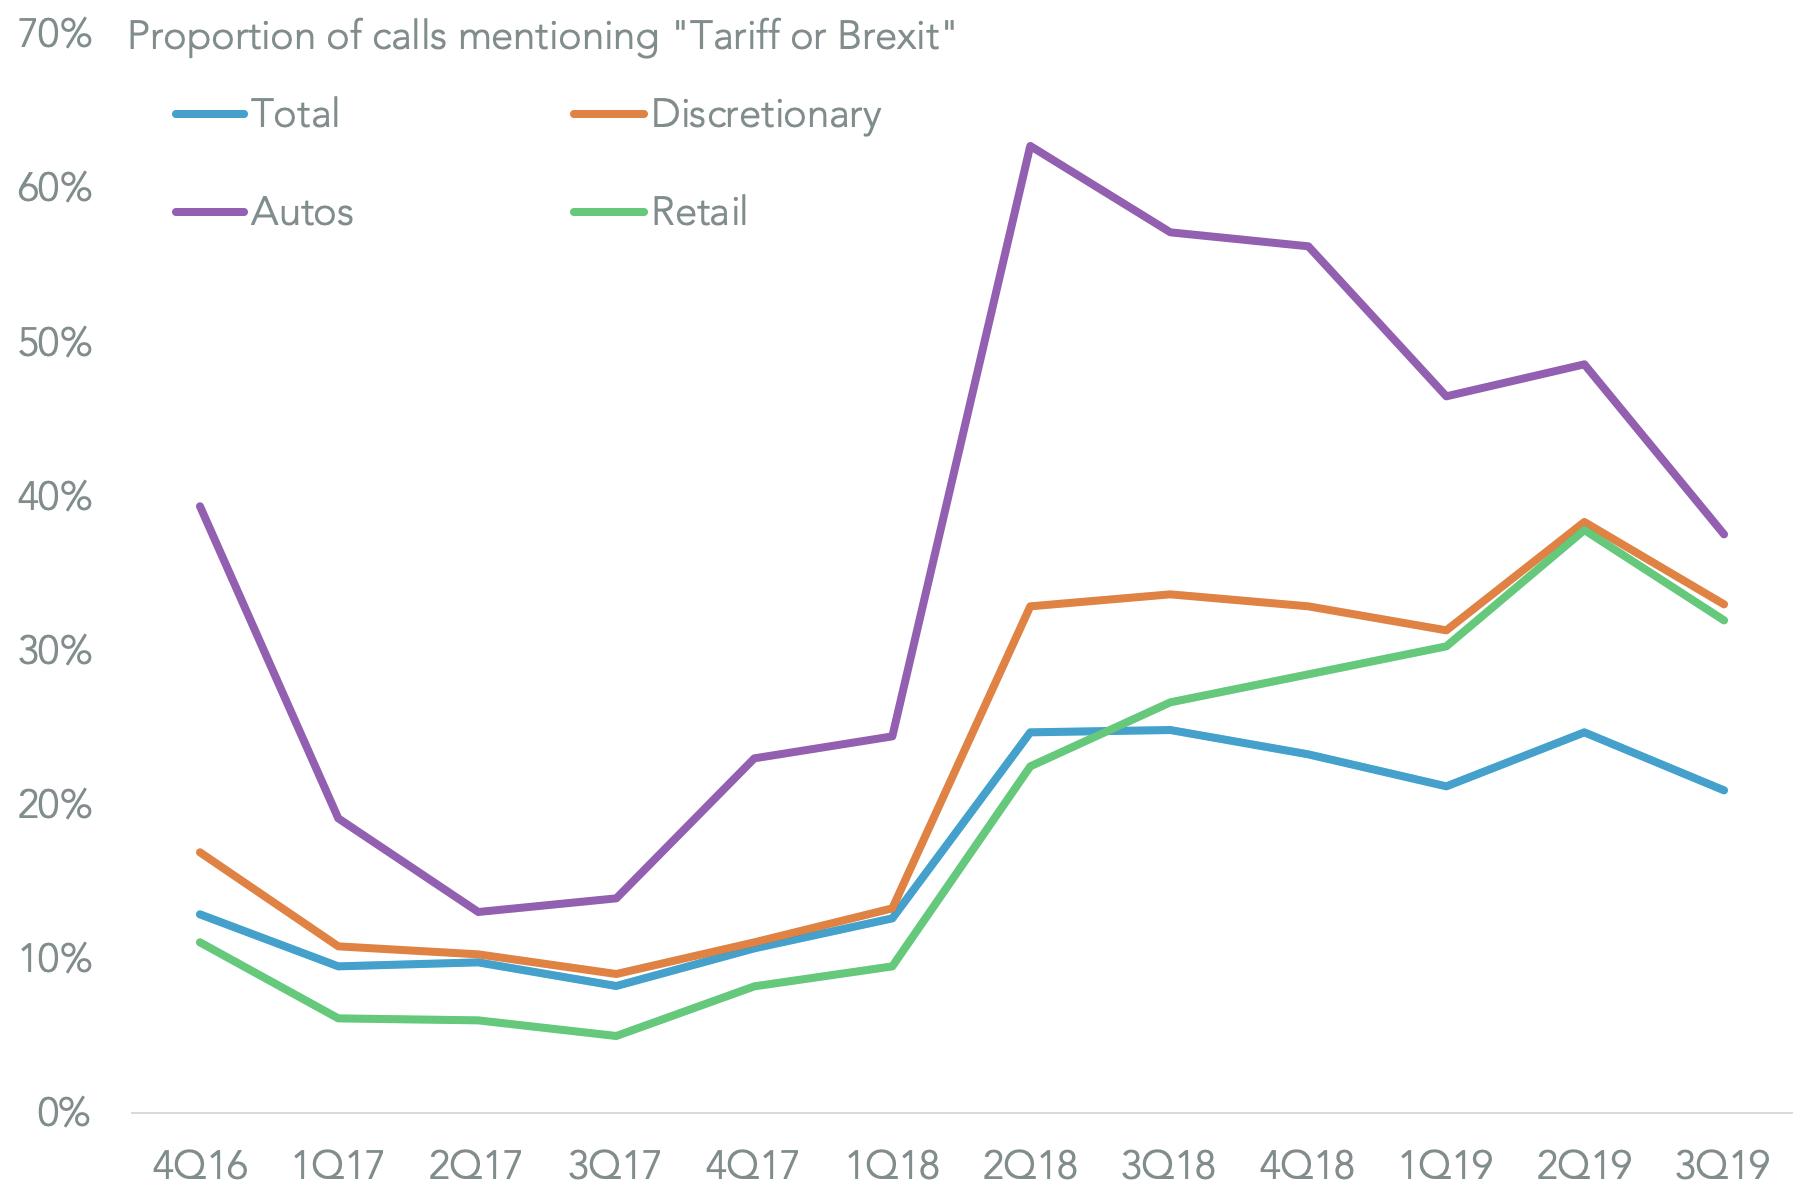 20191127-tqw-retailers-transcripts